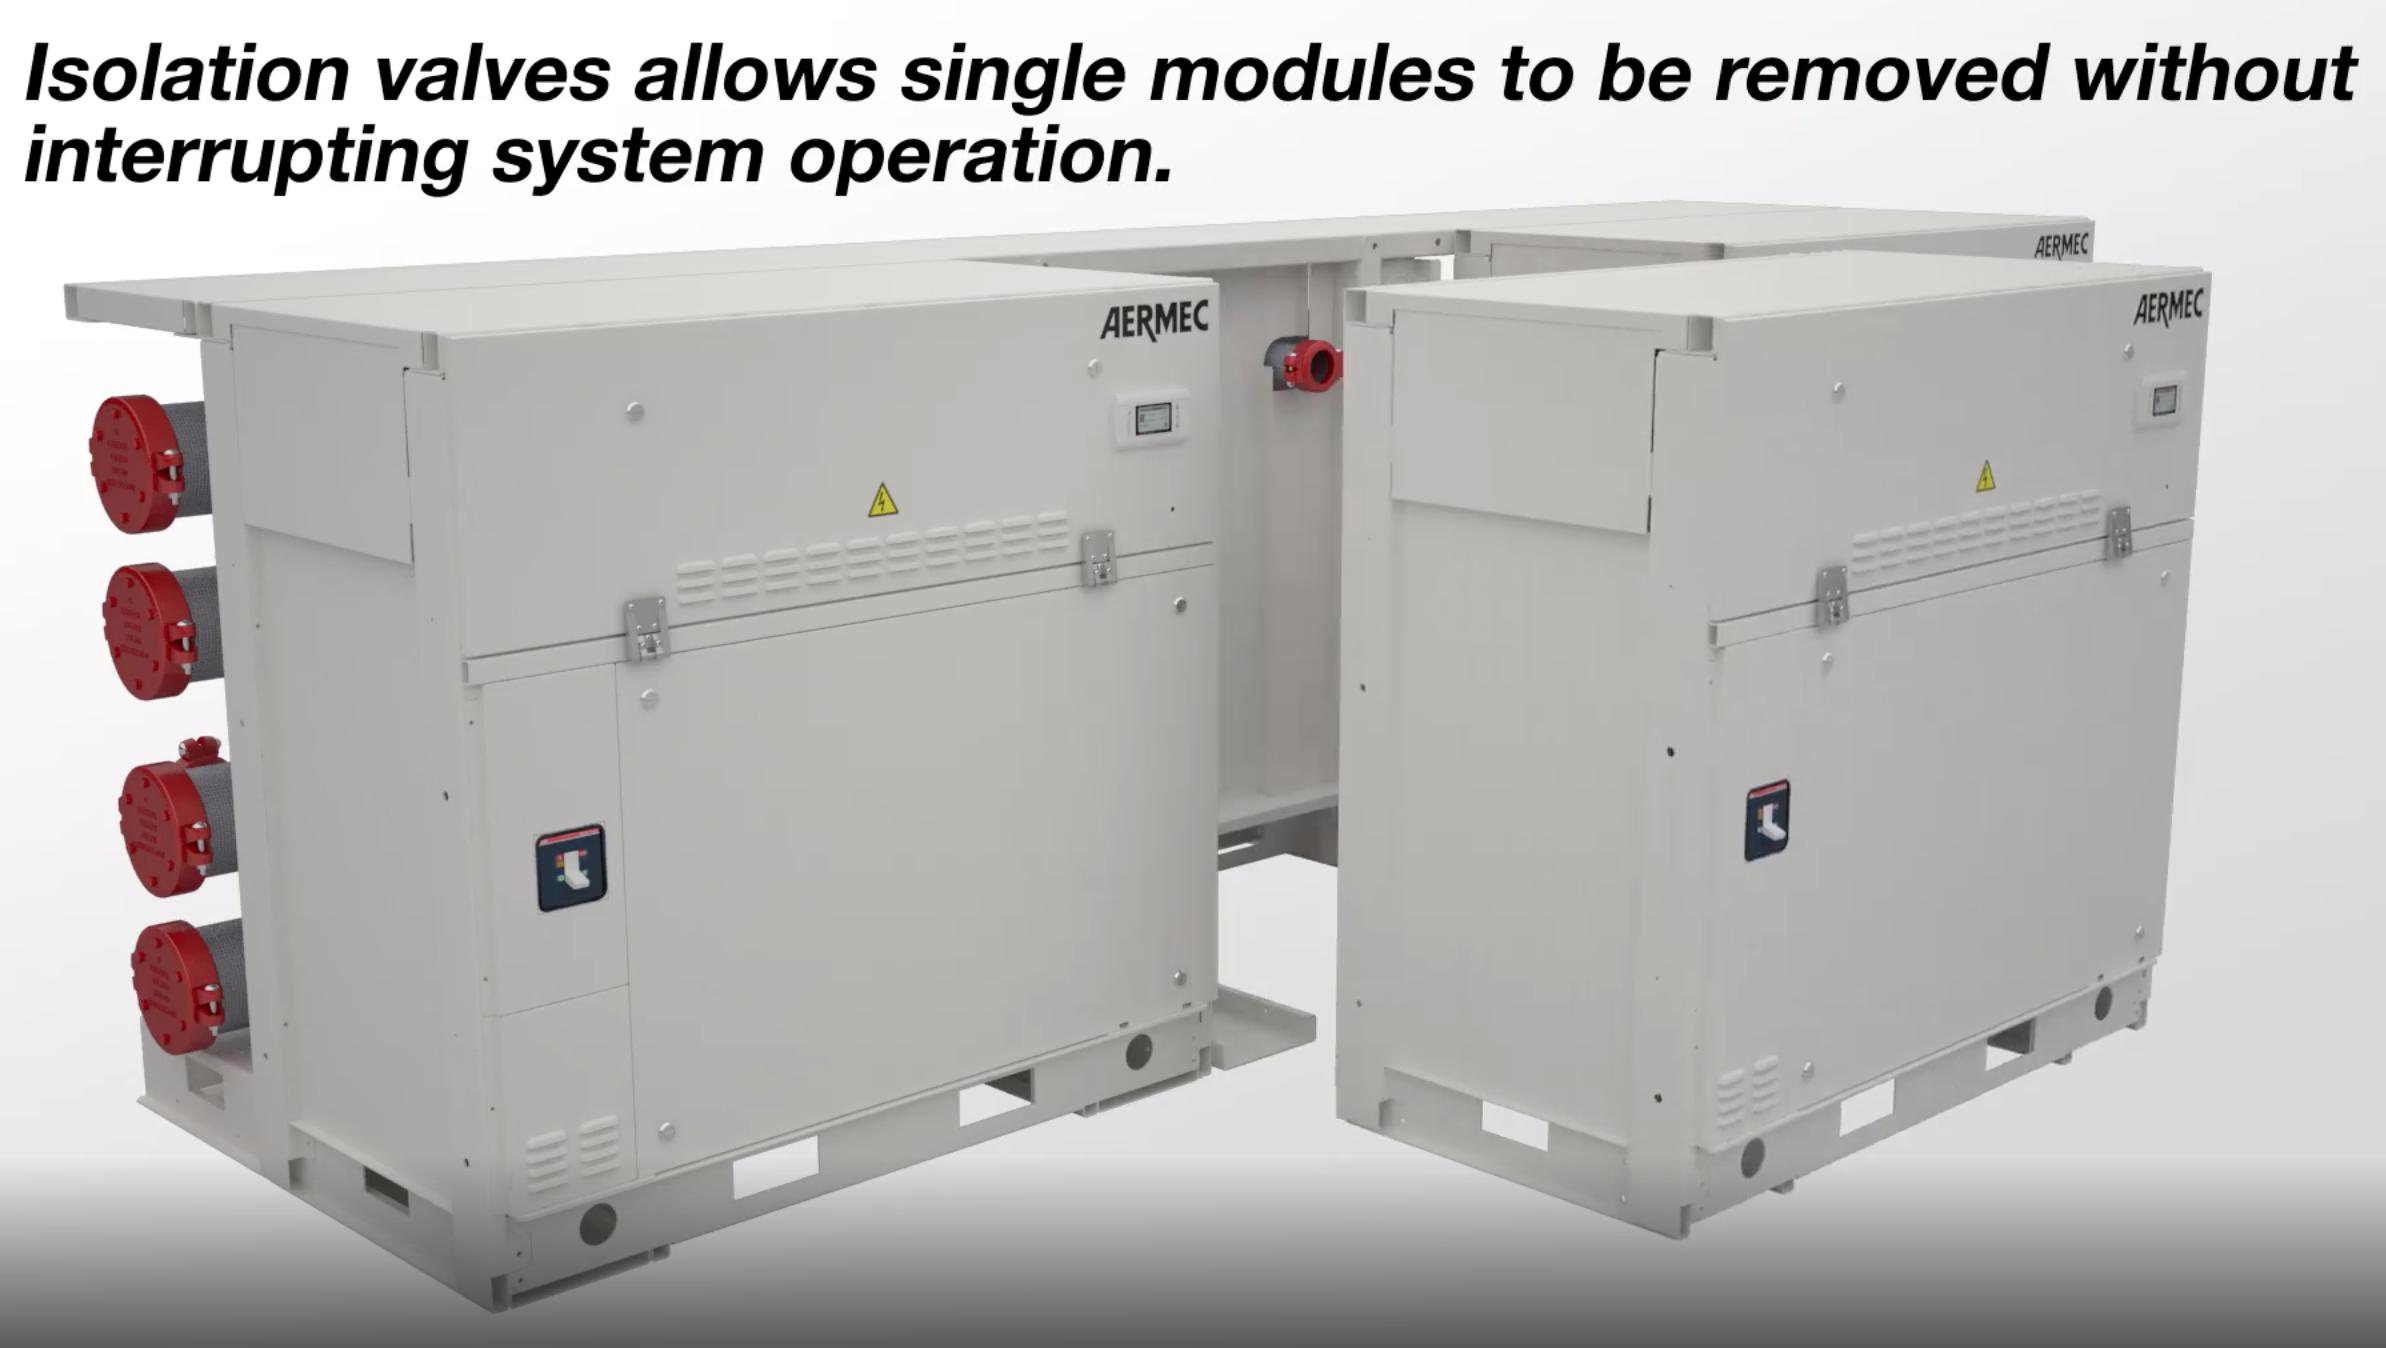 Aermec WWM Modular Chiller - No System Interruption